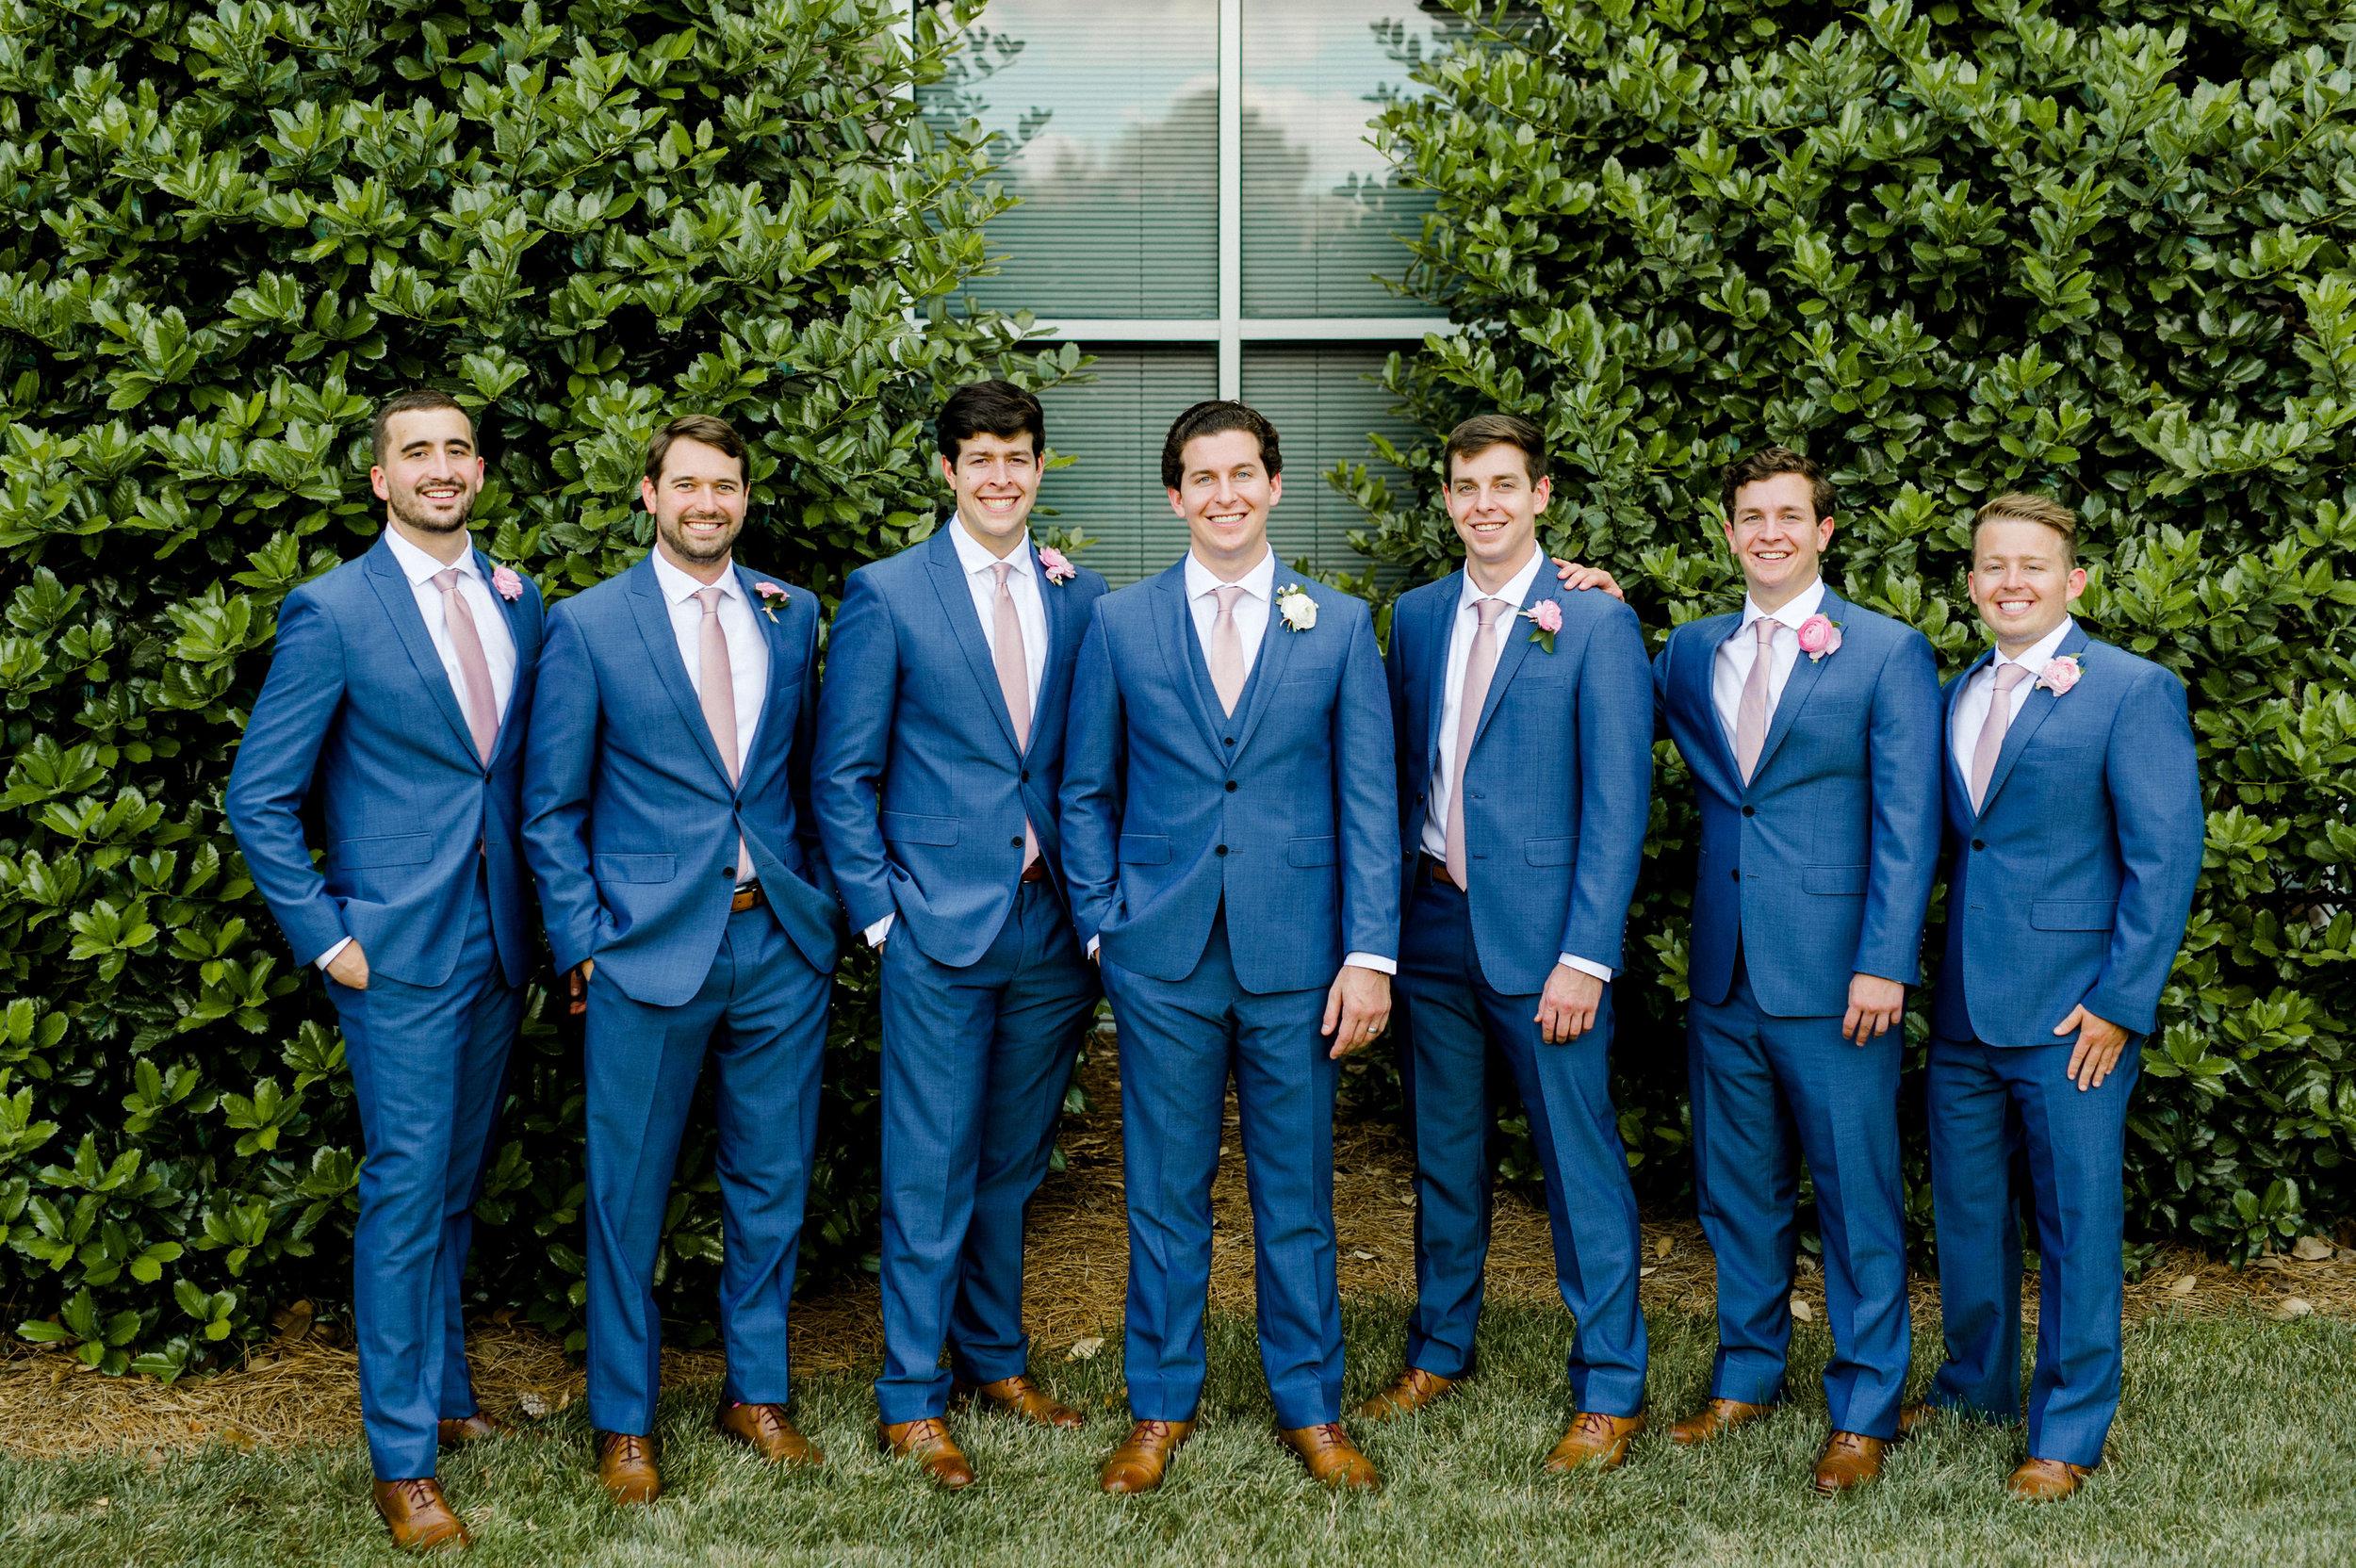 McElravey_Wedding_CarolineLimaPhotography_2018_142.jpg